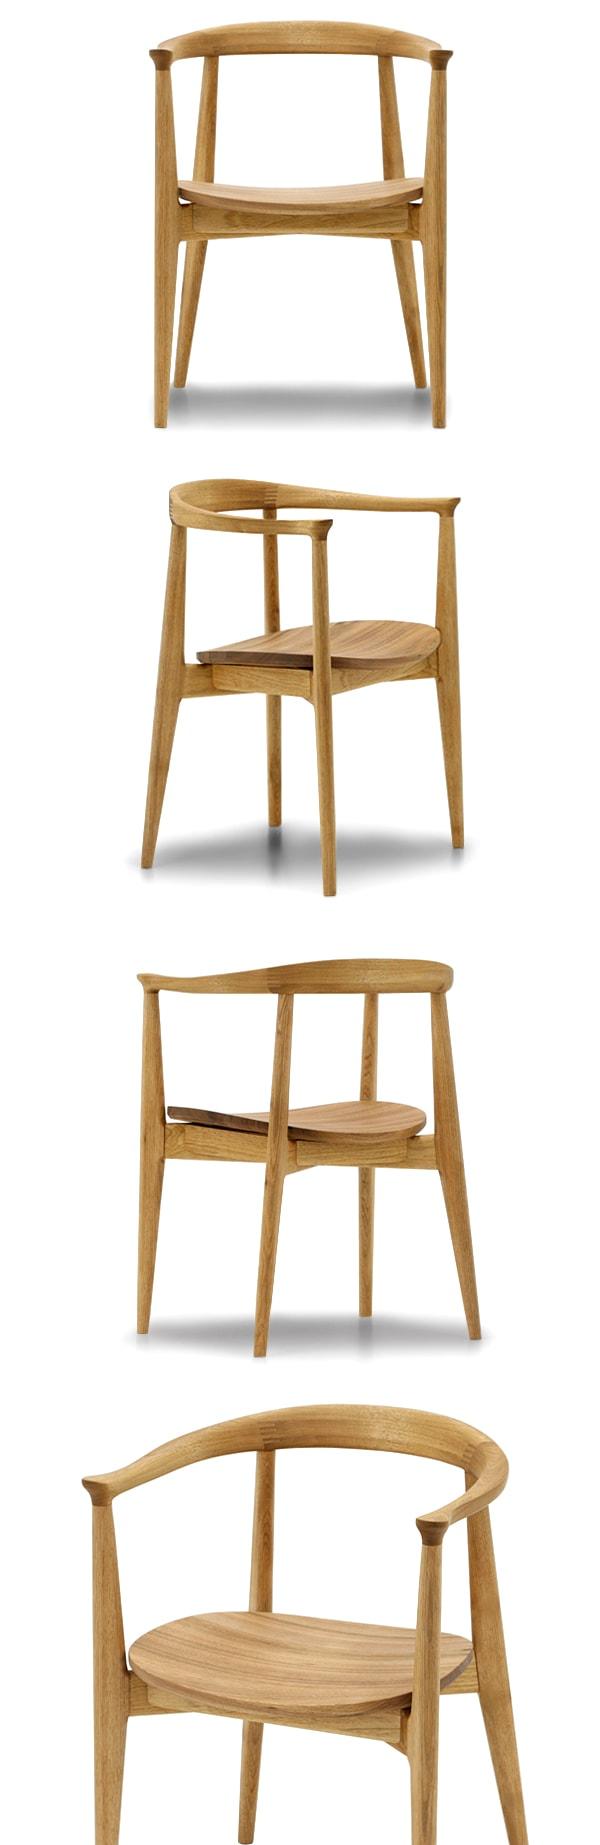 curumi,クルミの木,職人,手作り,椅子,北欧スタイル家具,天然木